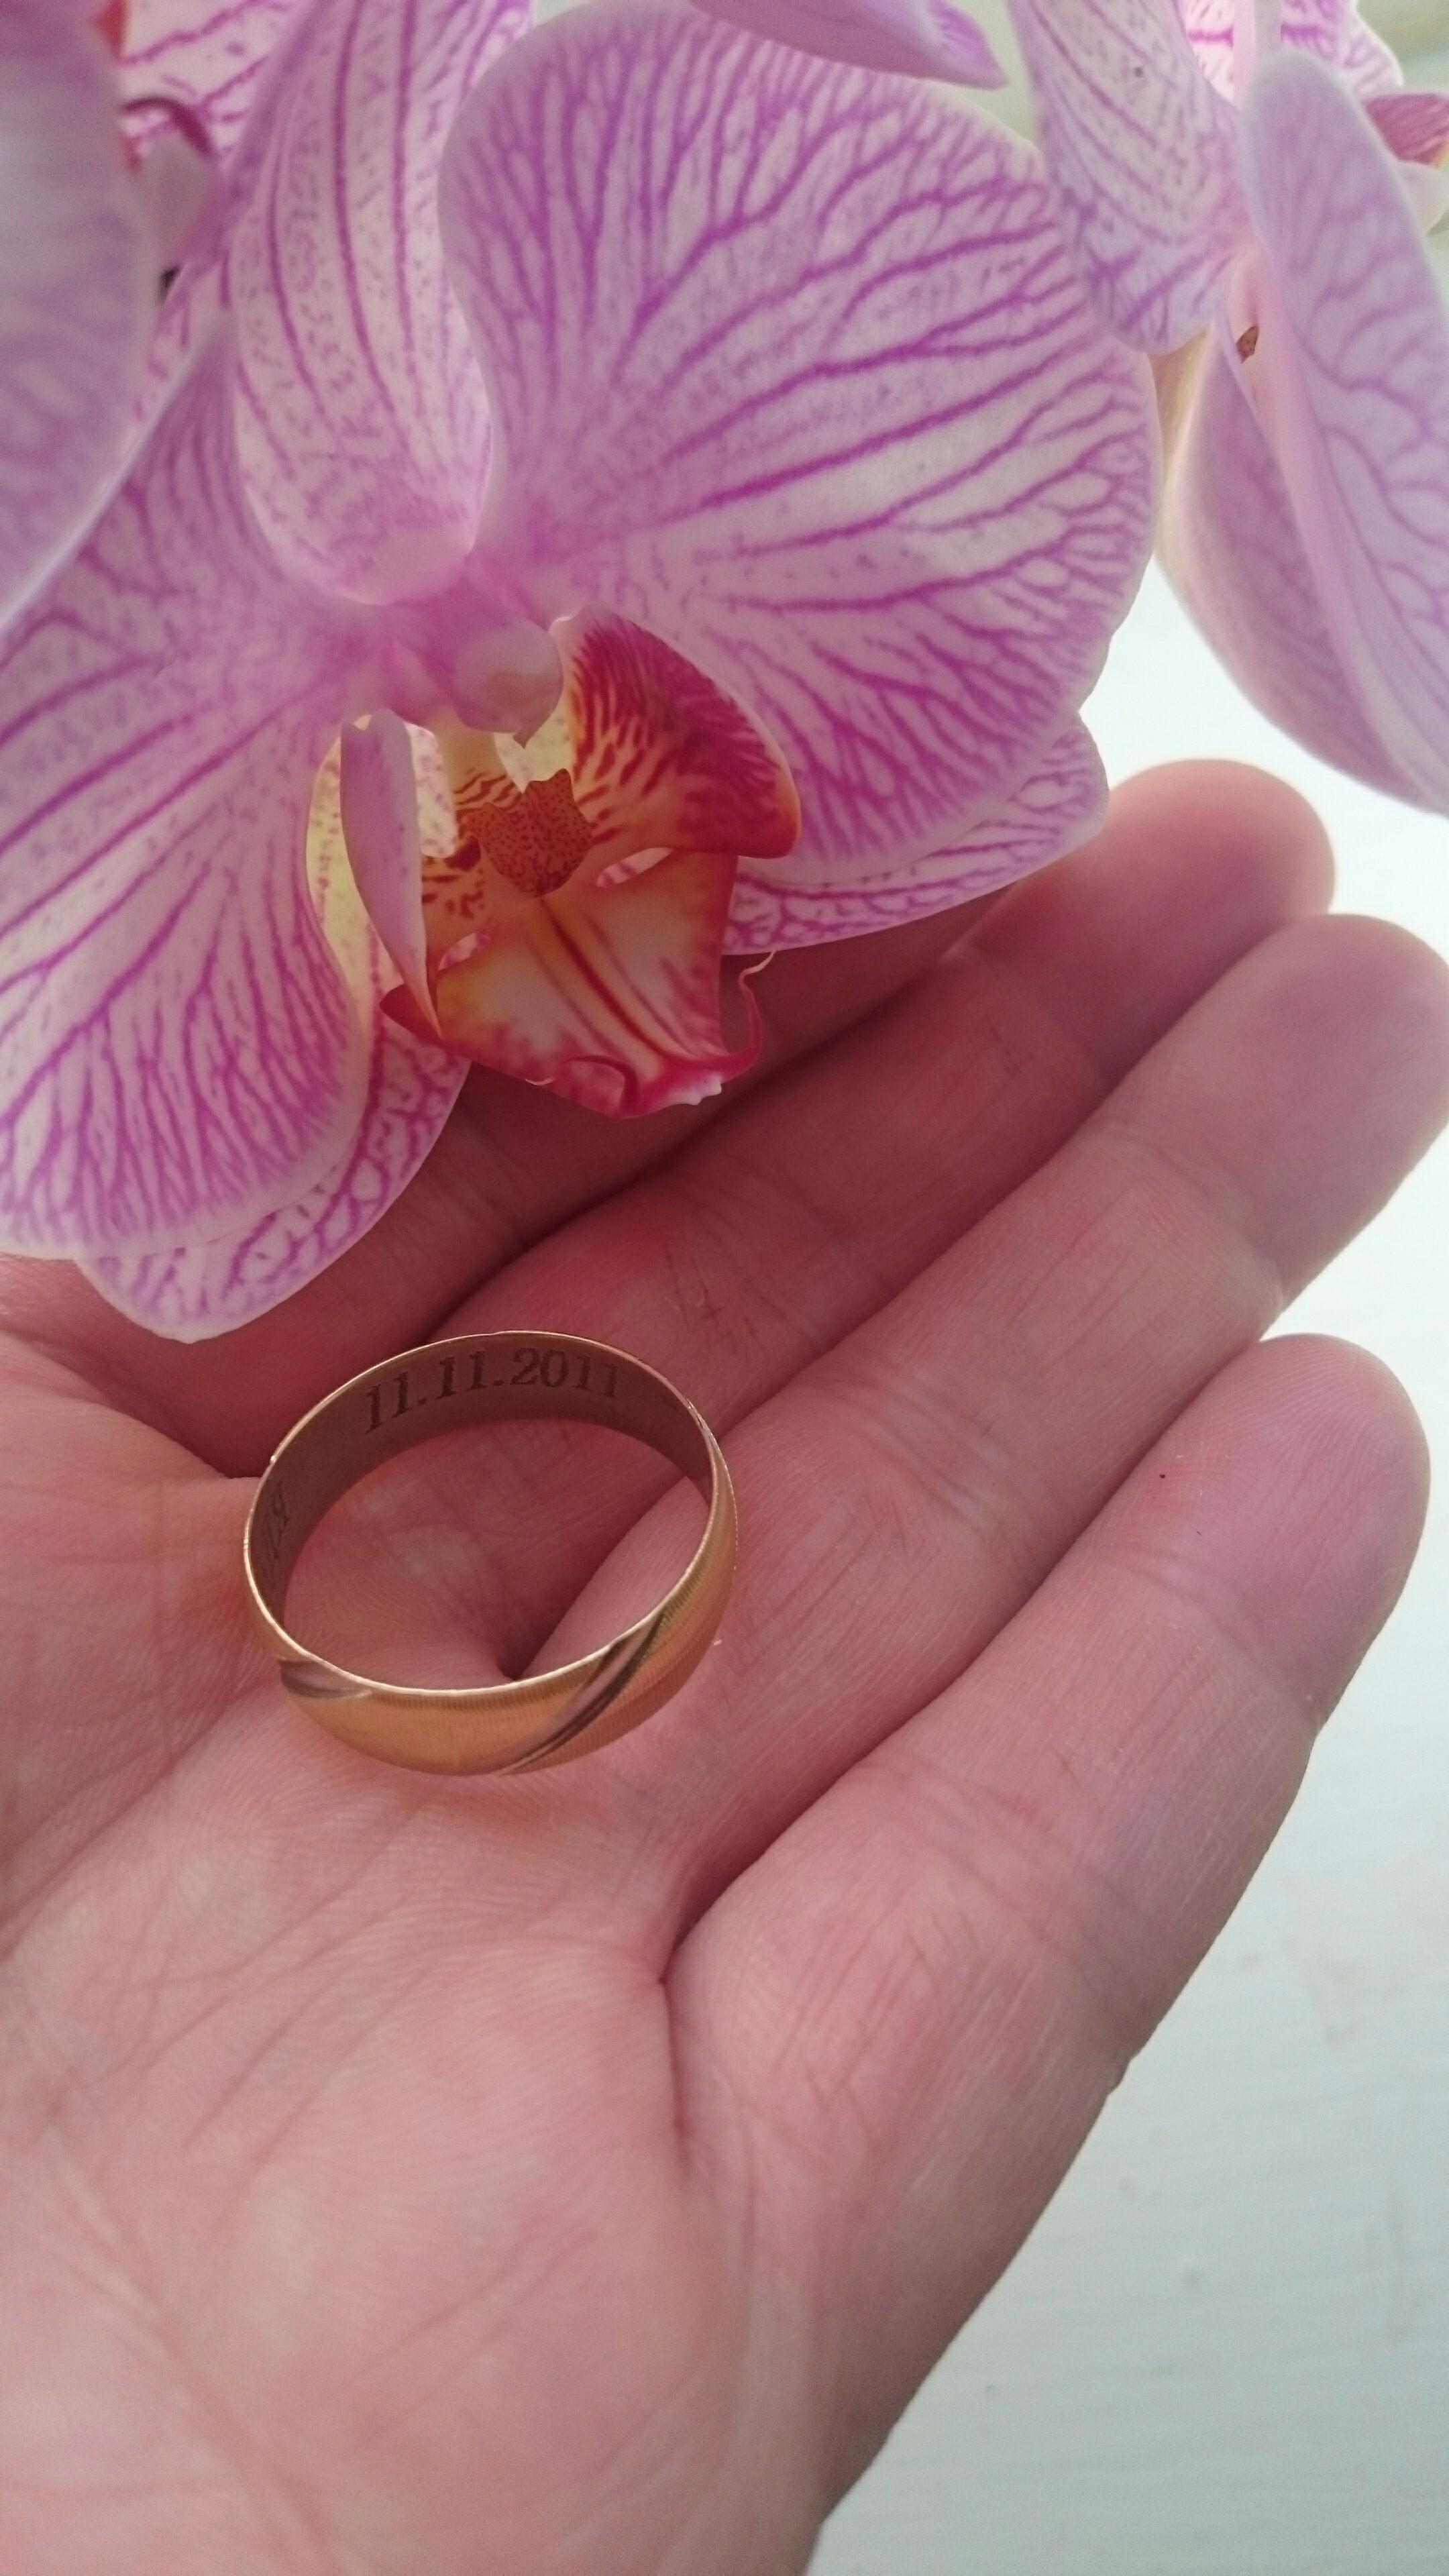 Heartbroken Mum Appeals For Help In Finding Her Lost Wedding Ring